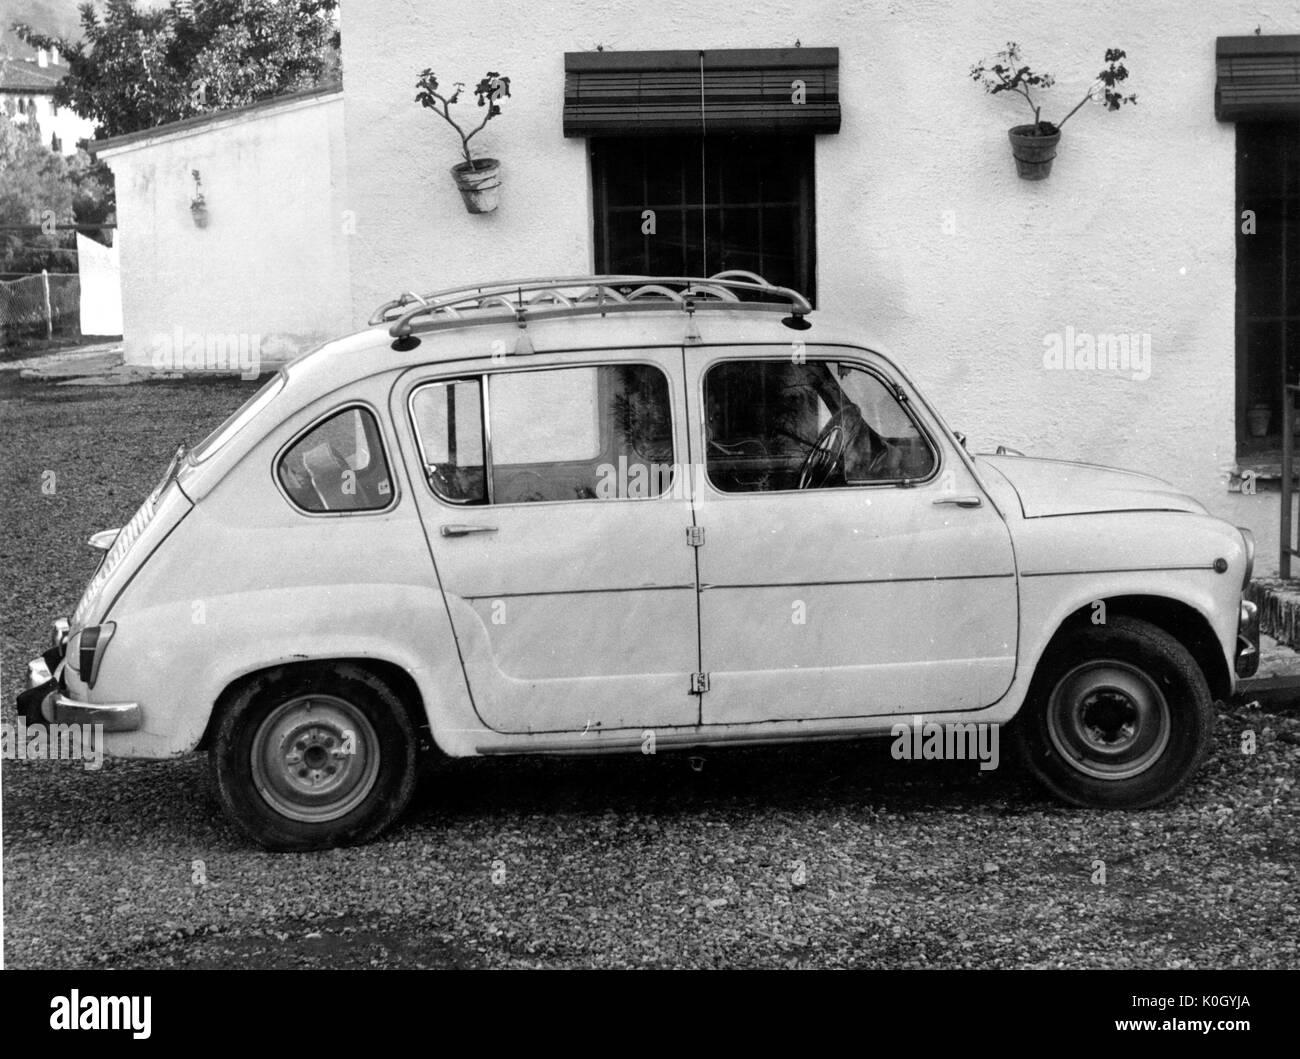 1960 SEAT 600 - Stock Image